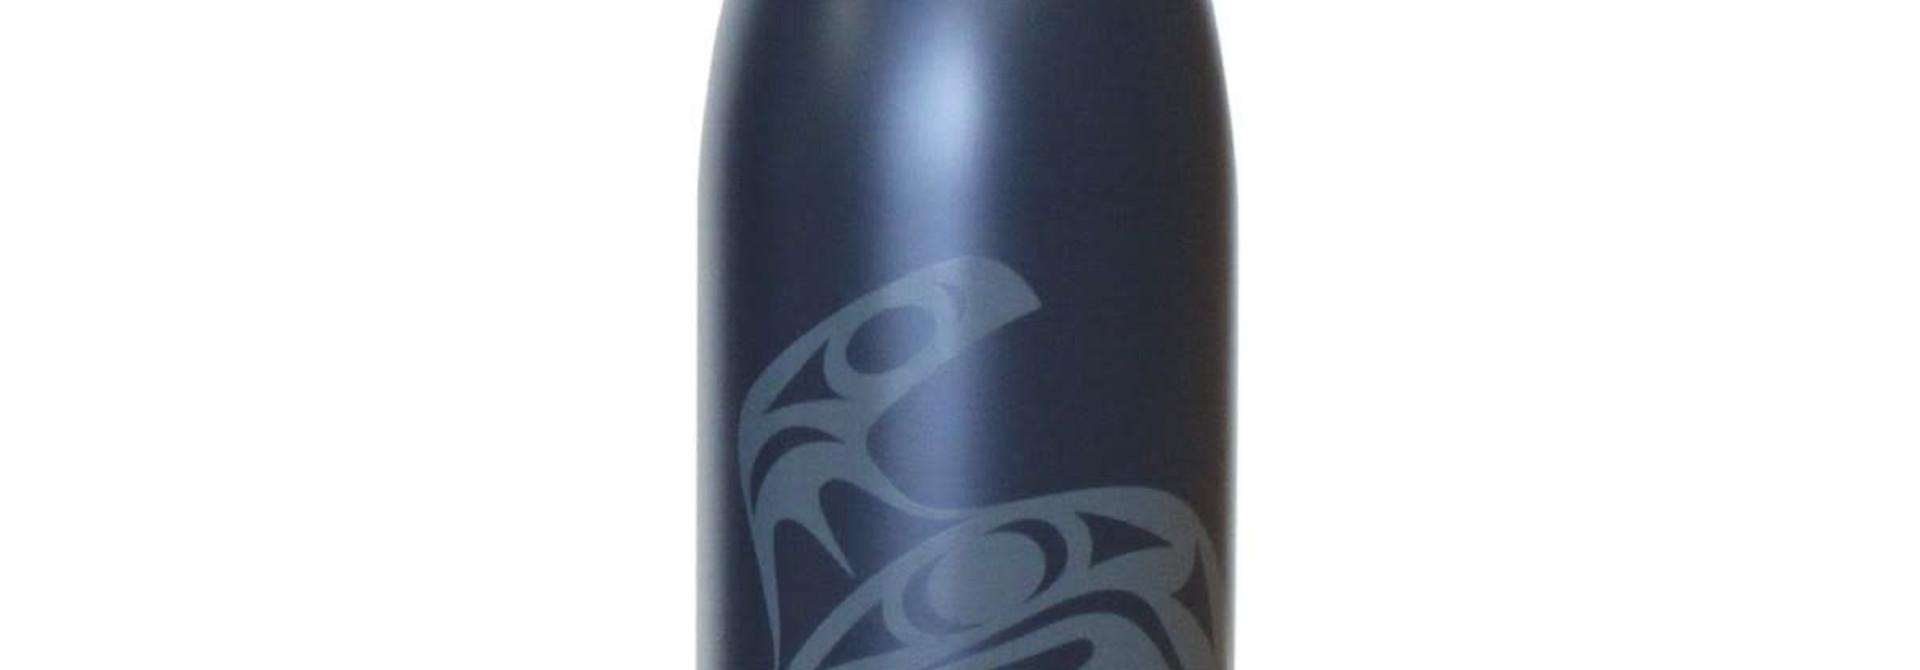 Insulated 25oz bottle-Orca by Maynard Johnny Jr.